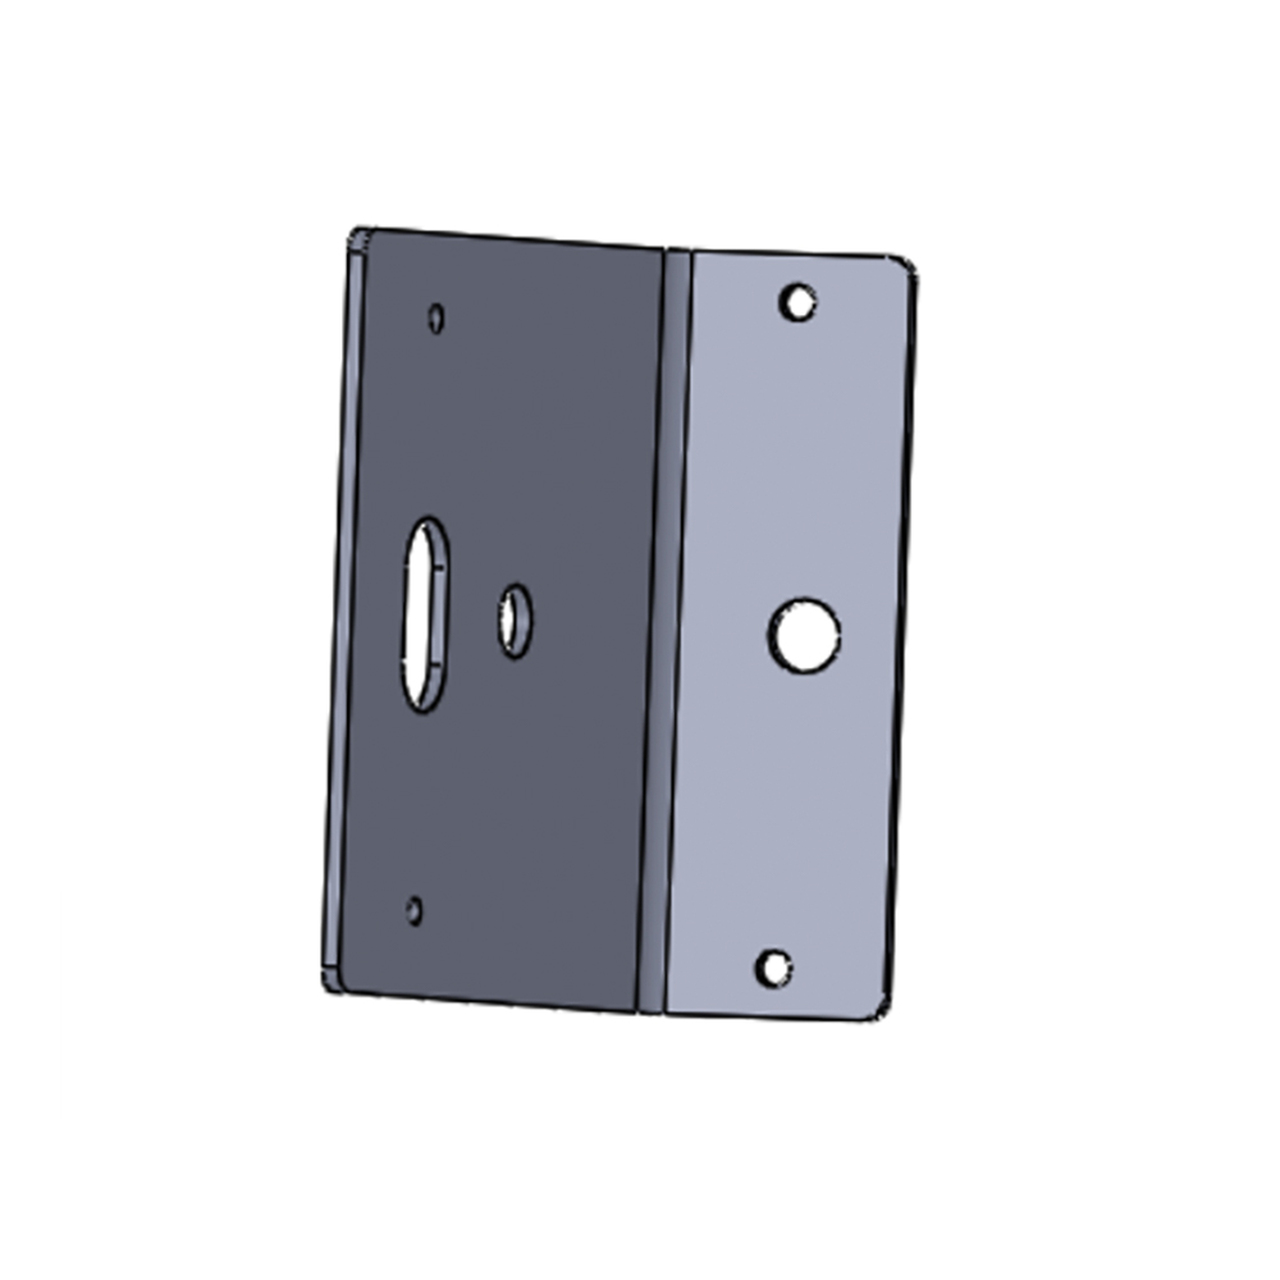 Code-3 B-Pillar 100 Degree Window Brackets for Chevy Caprice, Fits T-Rex®, XTP3 and Torus® Lights